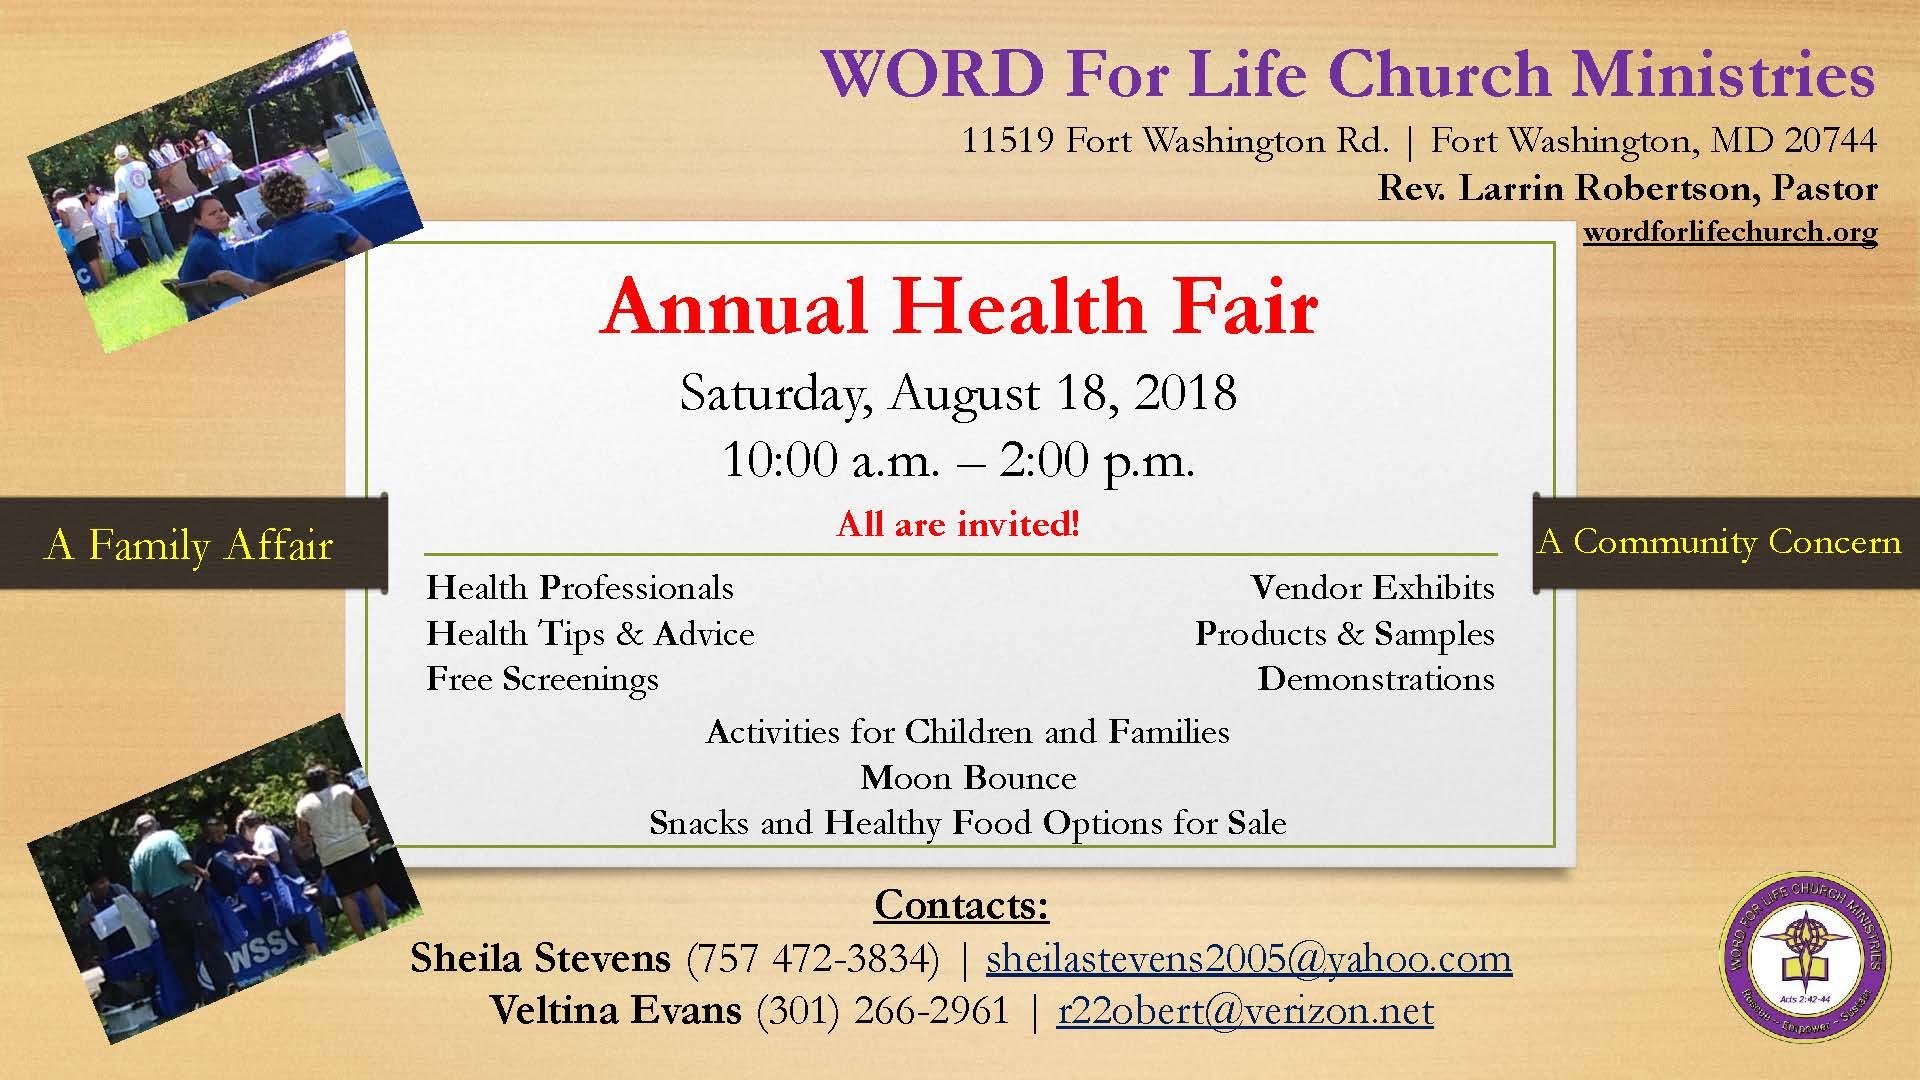 Word For Life Church Annual Community Health Fair and Back to School Fair